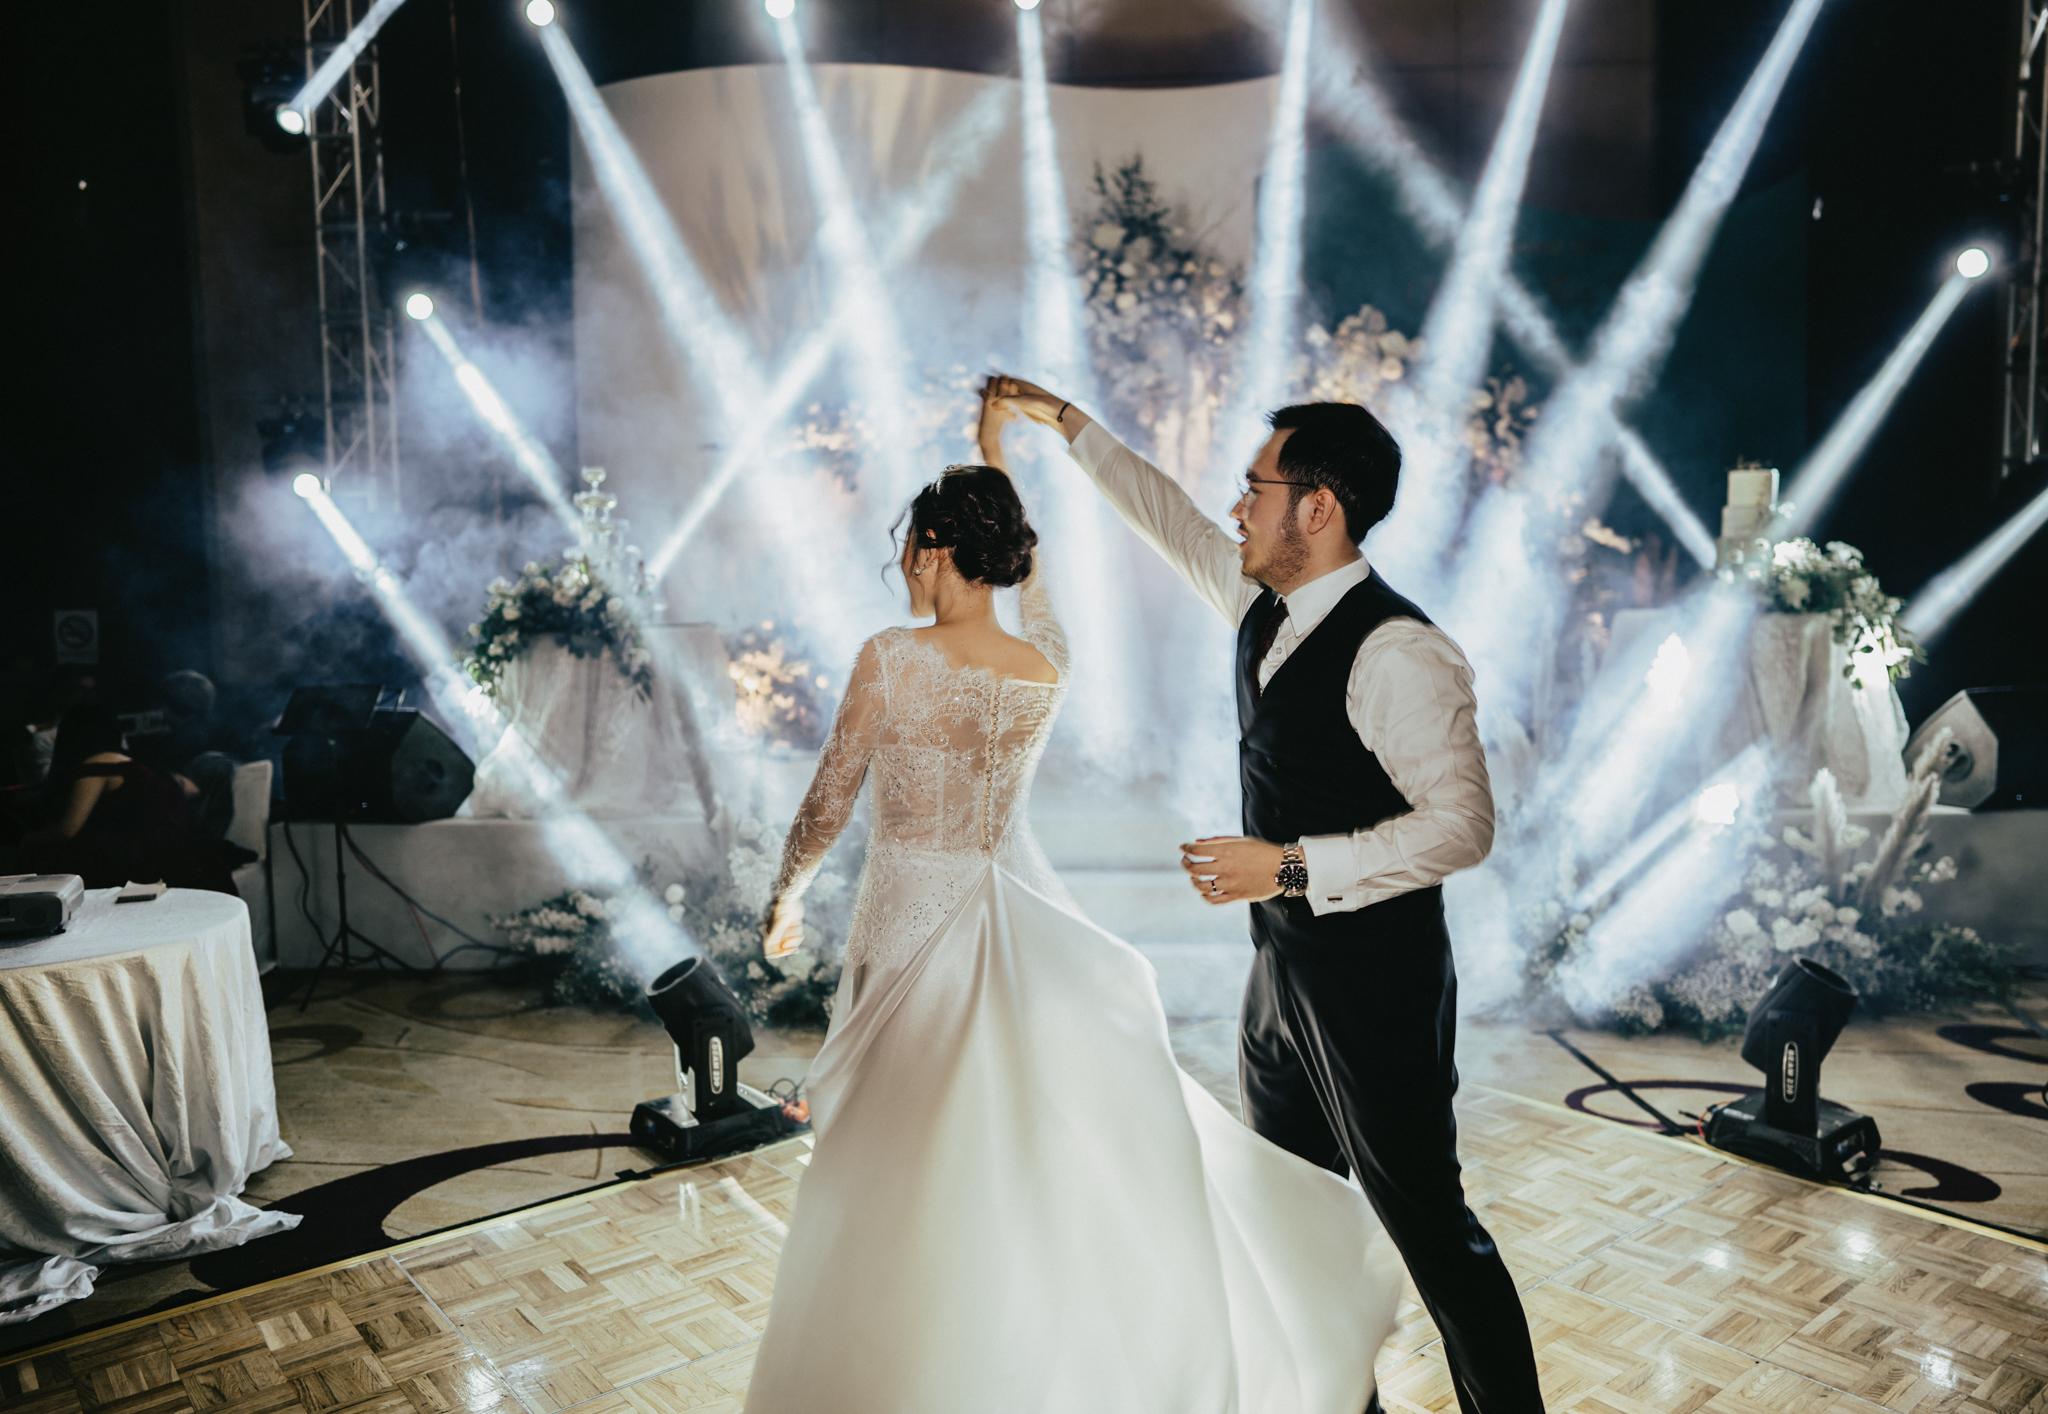 JWMarriott Ha Noi Intimate Wedding of Trang Hi well captured by Hipster Wedding Vietnam Wedding Photographer-36325.jpg